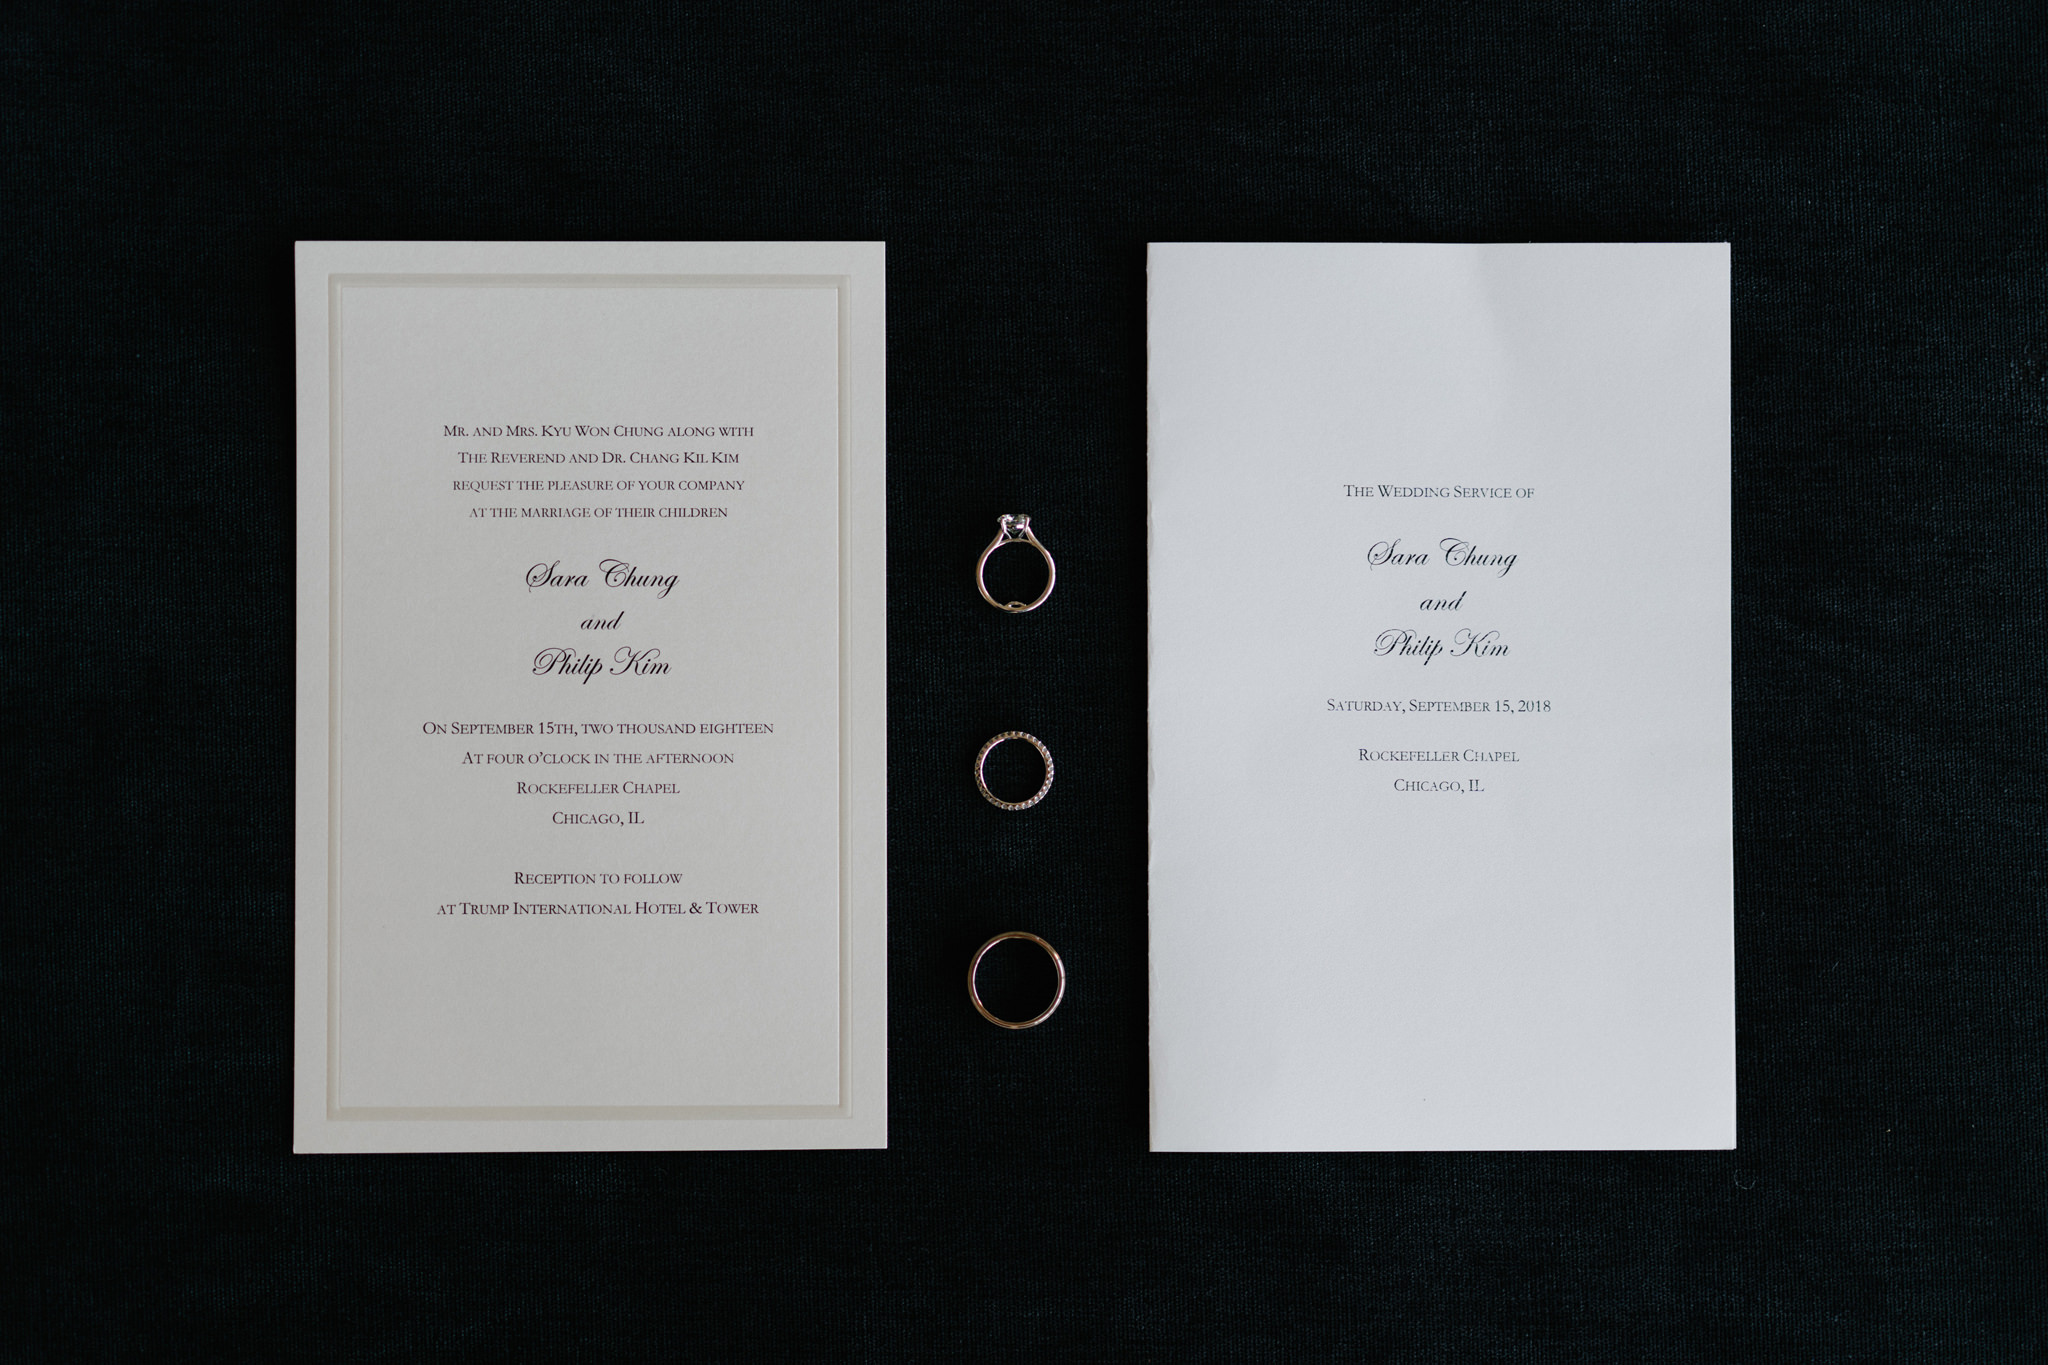 001-rempel-photography-chicago-wedding-inspiration-sara-philip-rockefeller-chapel-trump-tower.jpg